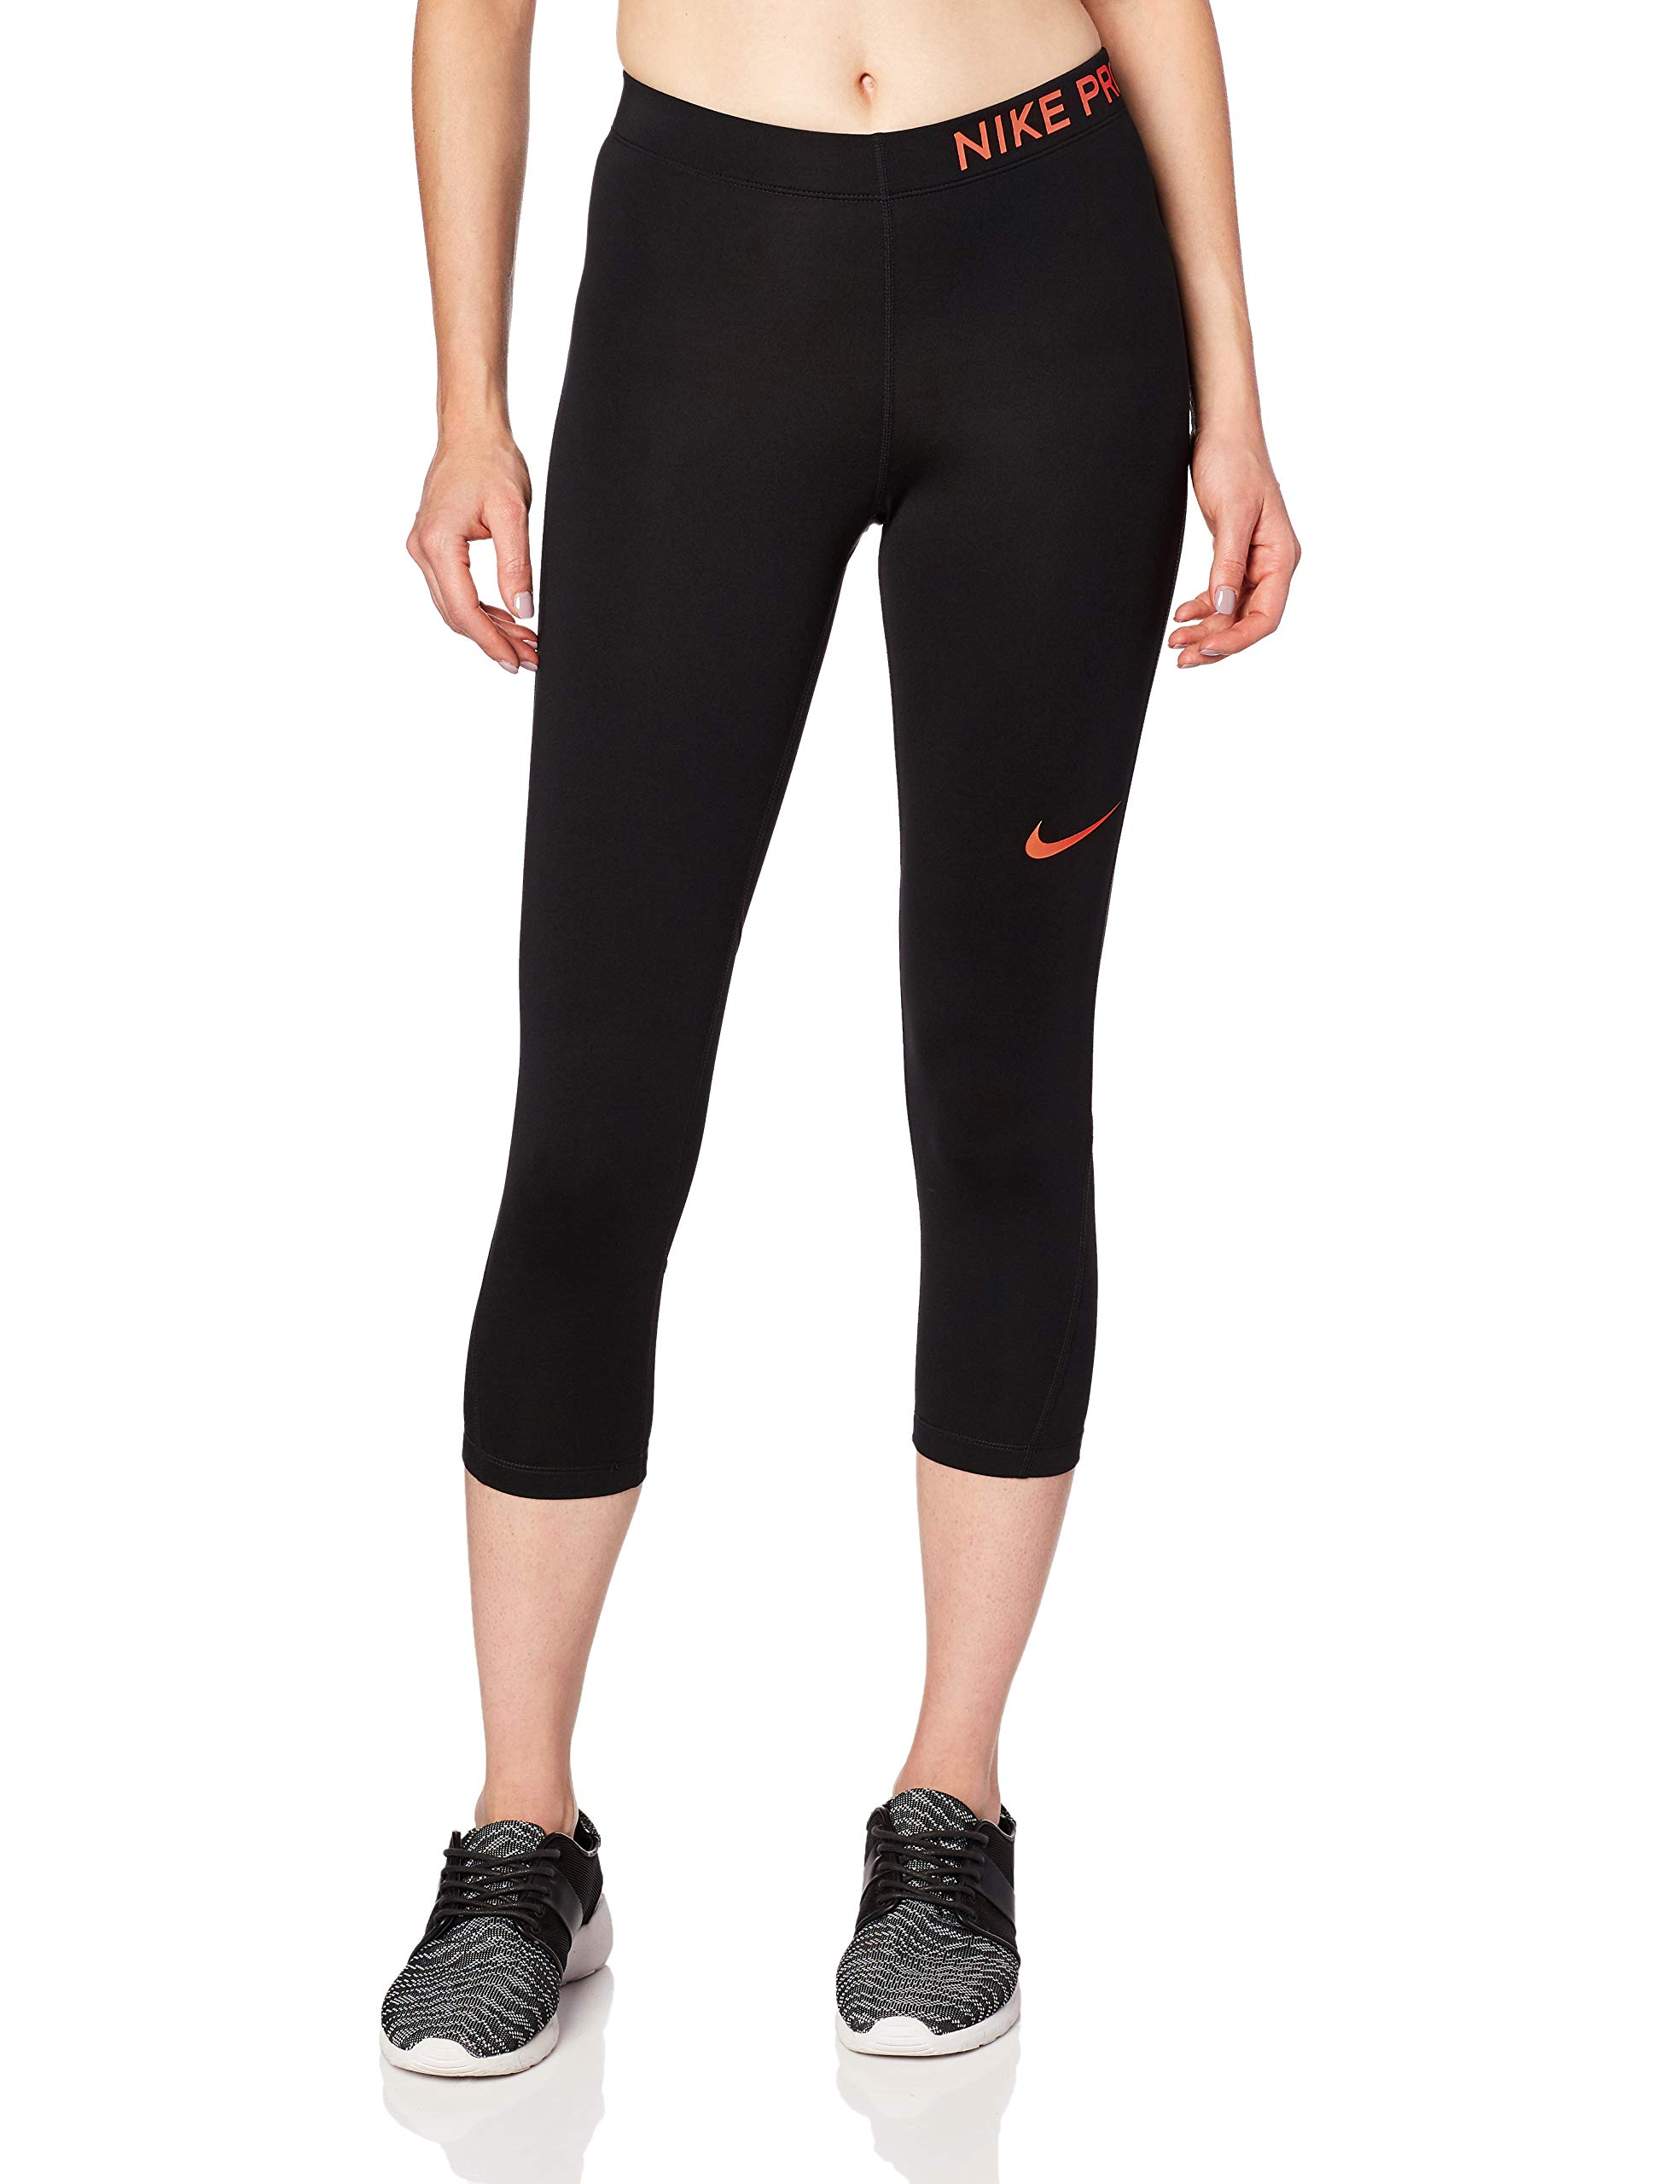 Nike Women's Pro Capri (Black/Racer Pink, M) by Nike